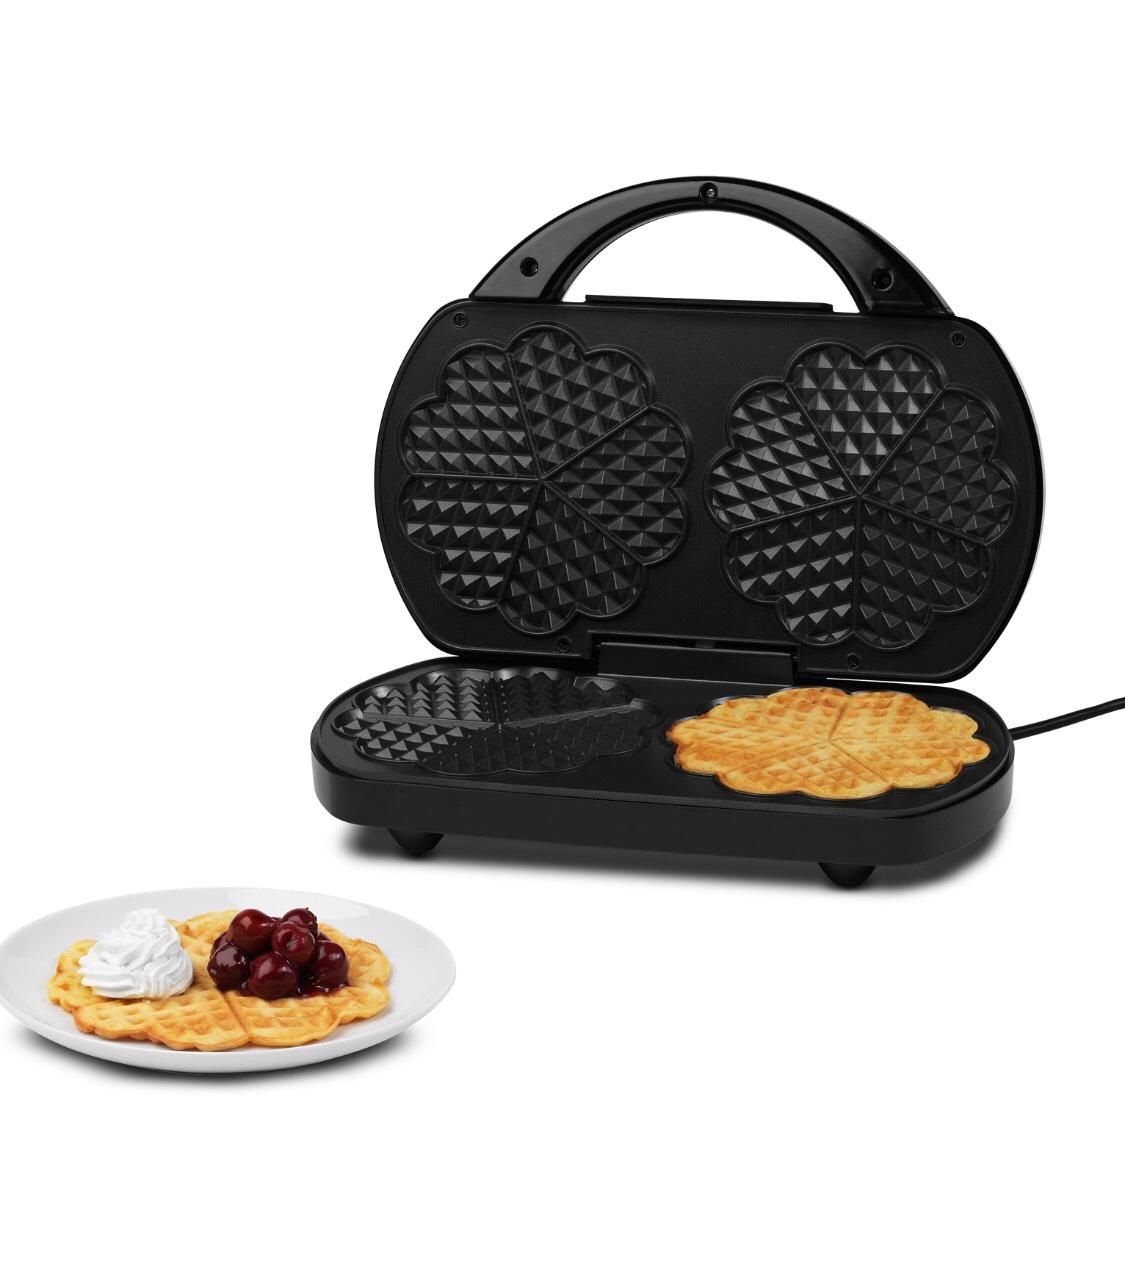 MEDION Double Waffle Maker 1200w £14.99